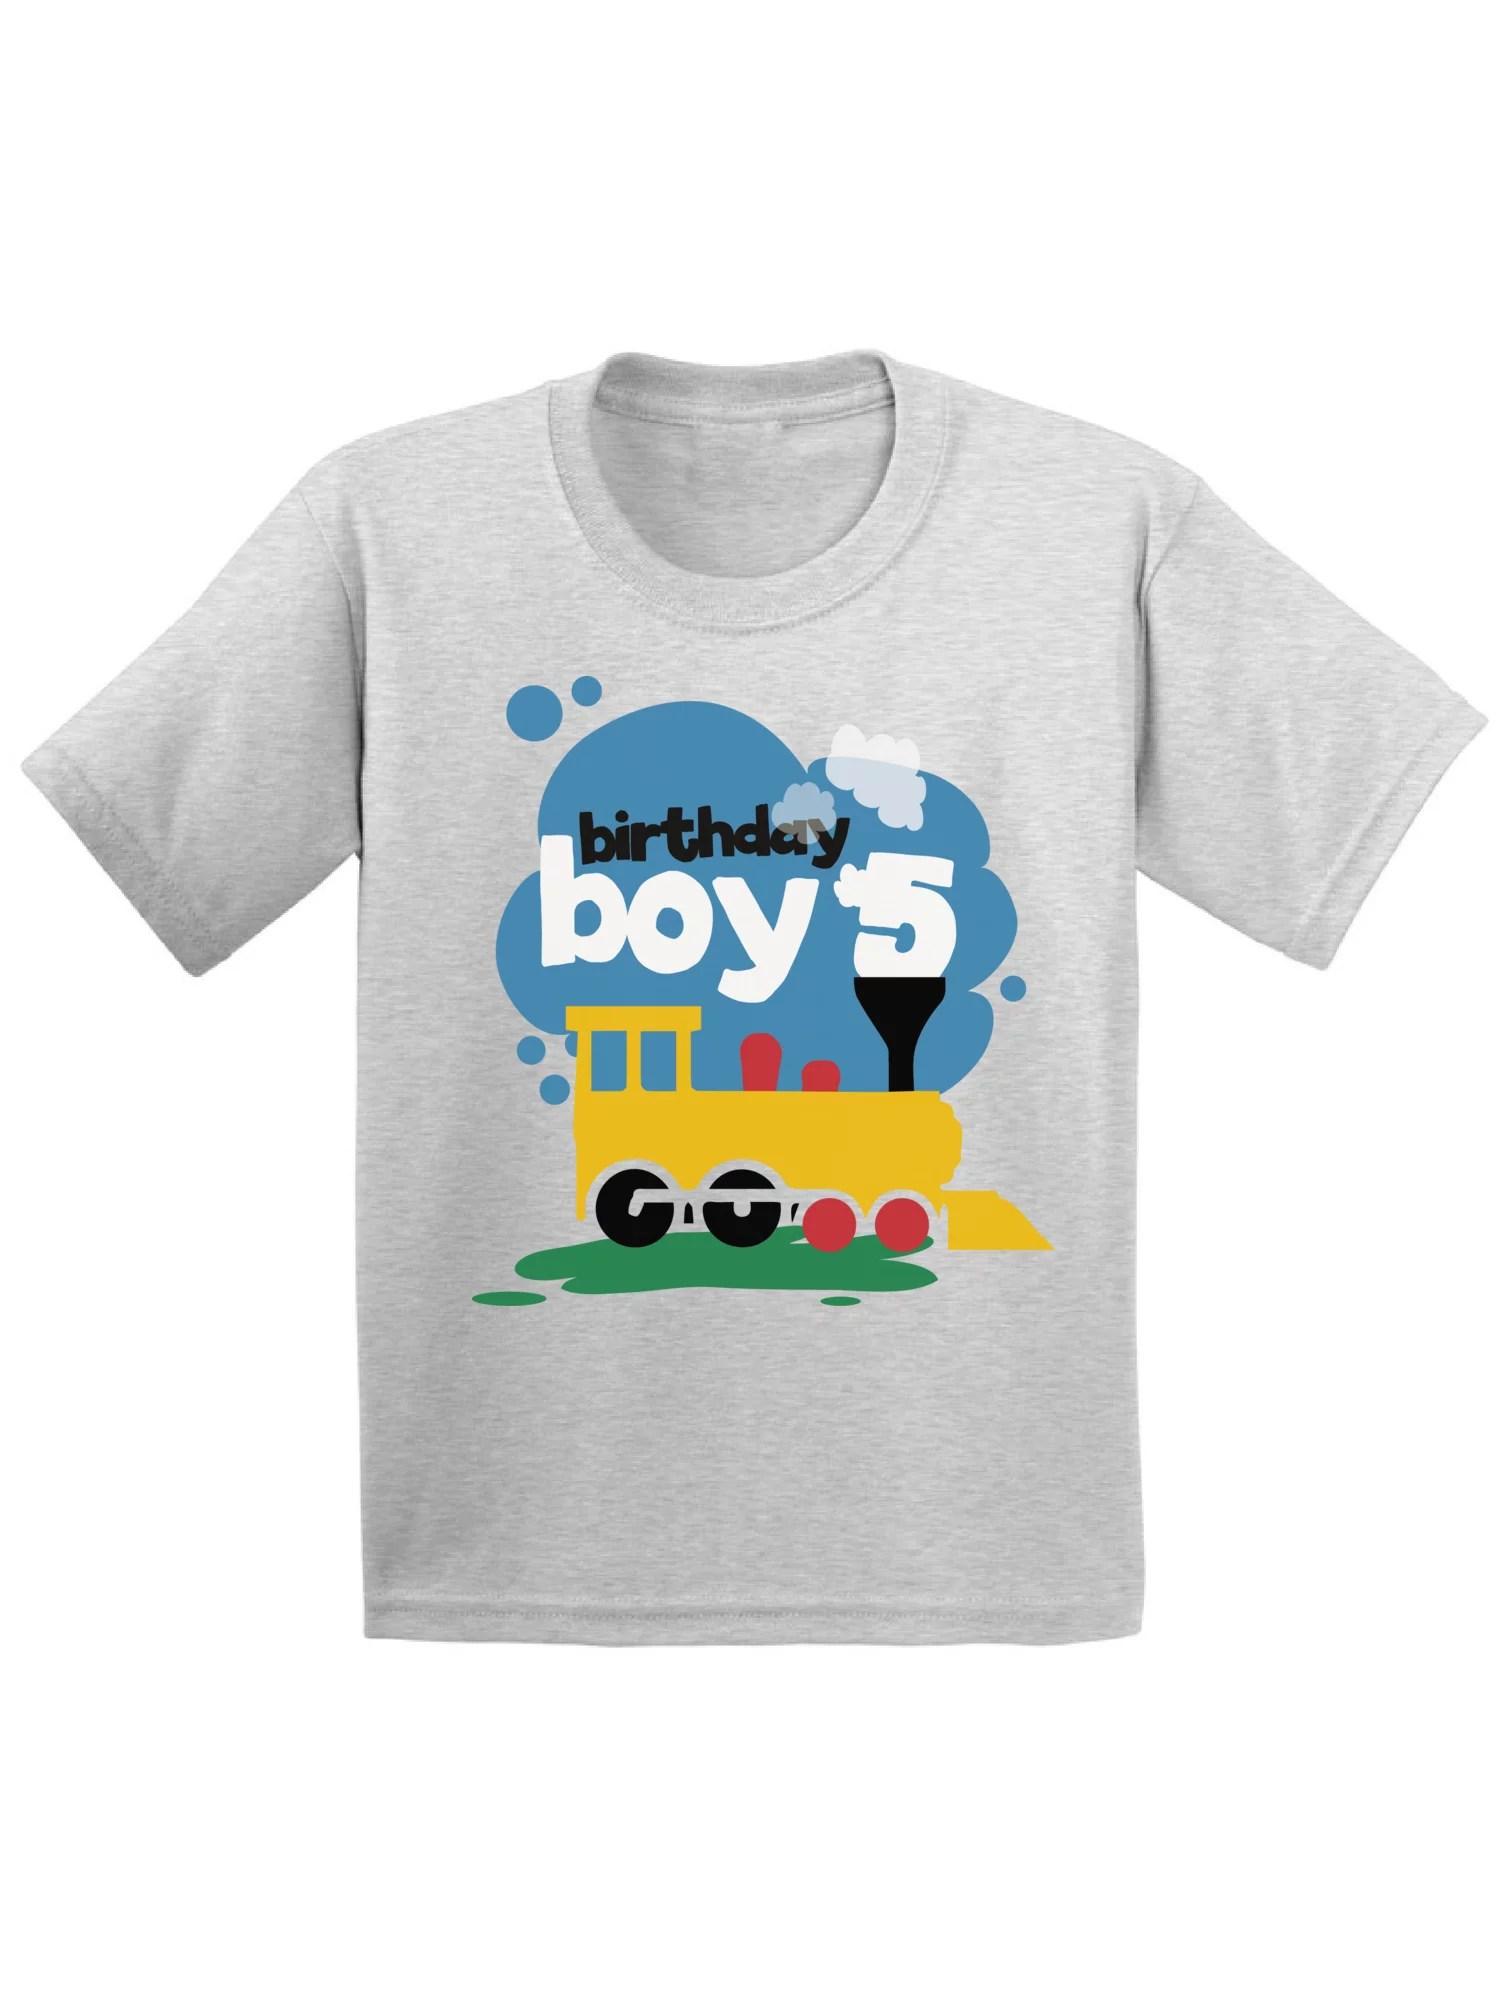 Awkward Styles Awkward Styles Toy Train Birthday Boy Youth Shirt 5th Birthday Party Tshirt For Boys Toy Truck Gifts For 5 Year Old Boy B Day Outfit Birthday Boy T Shirt Truck